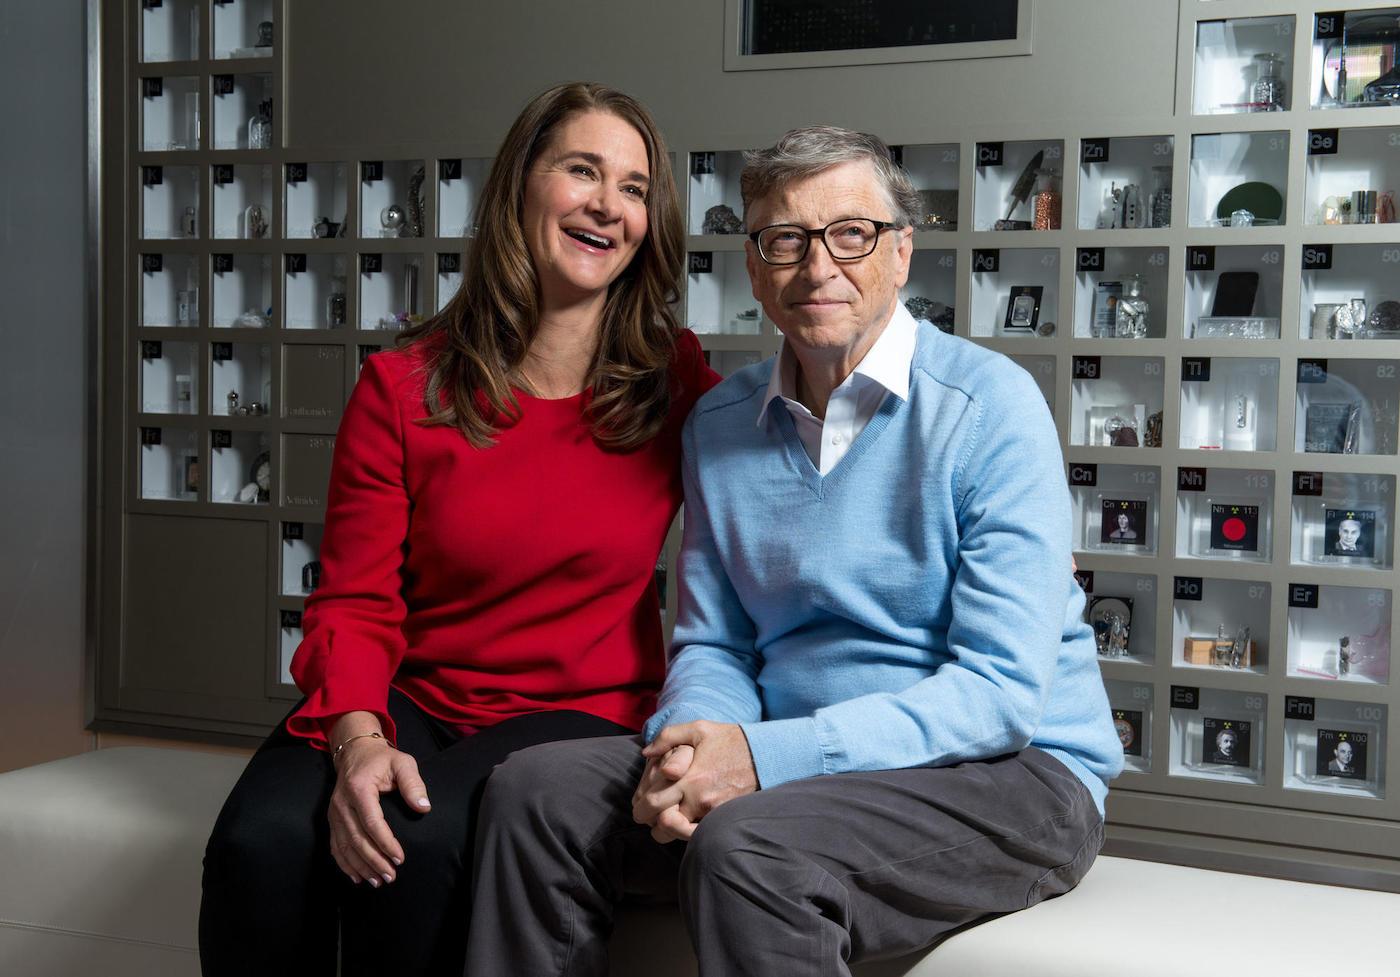 Relationship goals: Bill and Melinda Gates explain the algorithm of love to  us